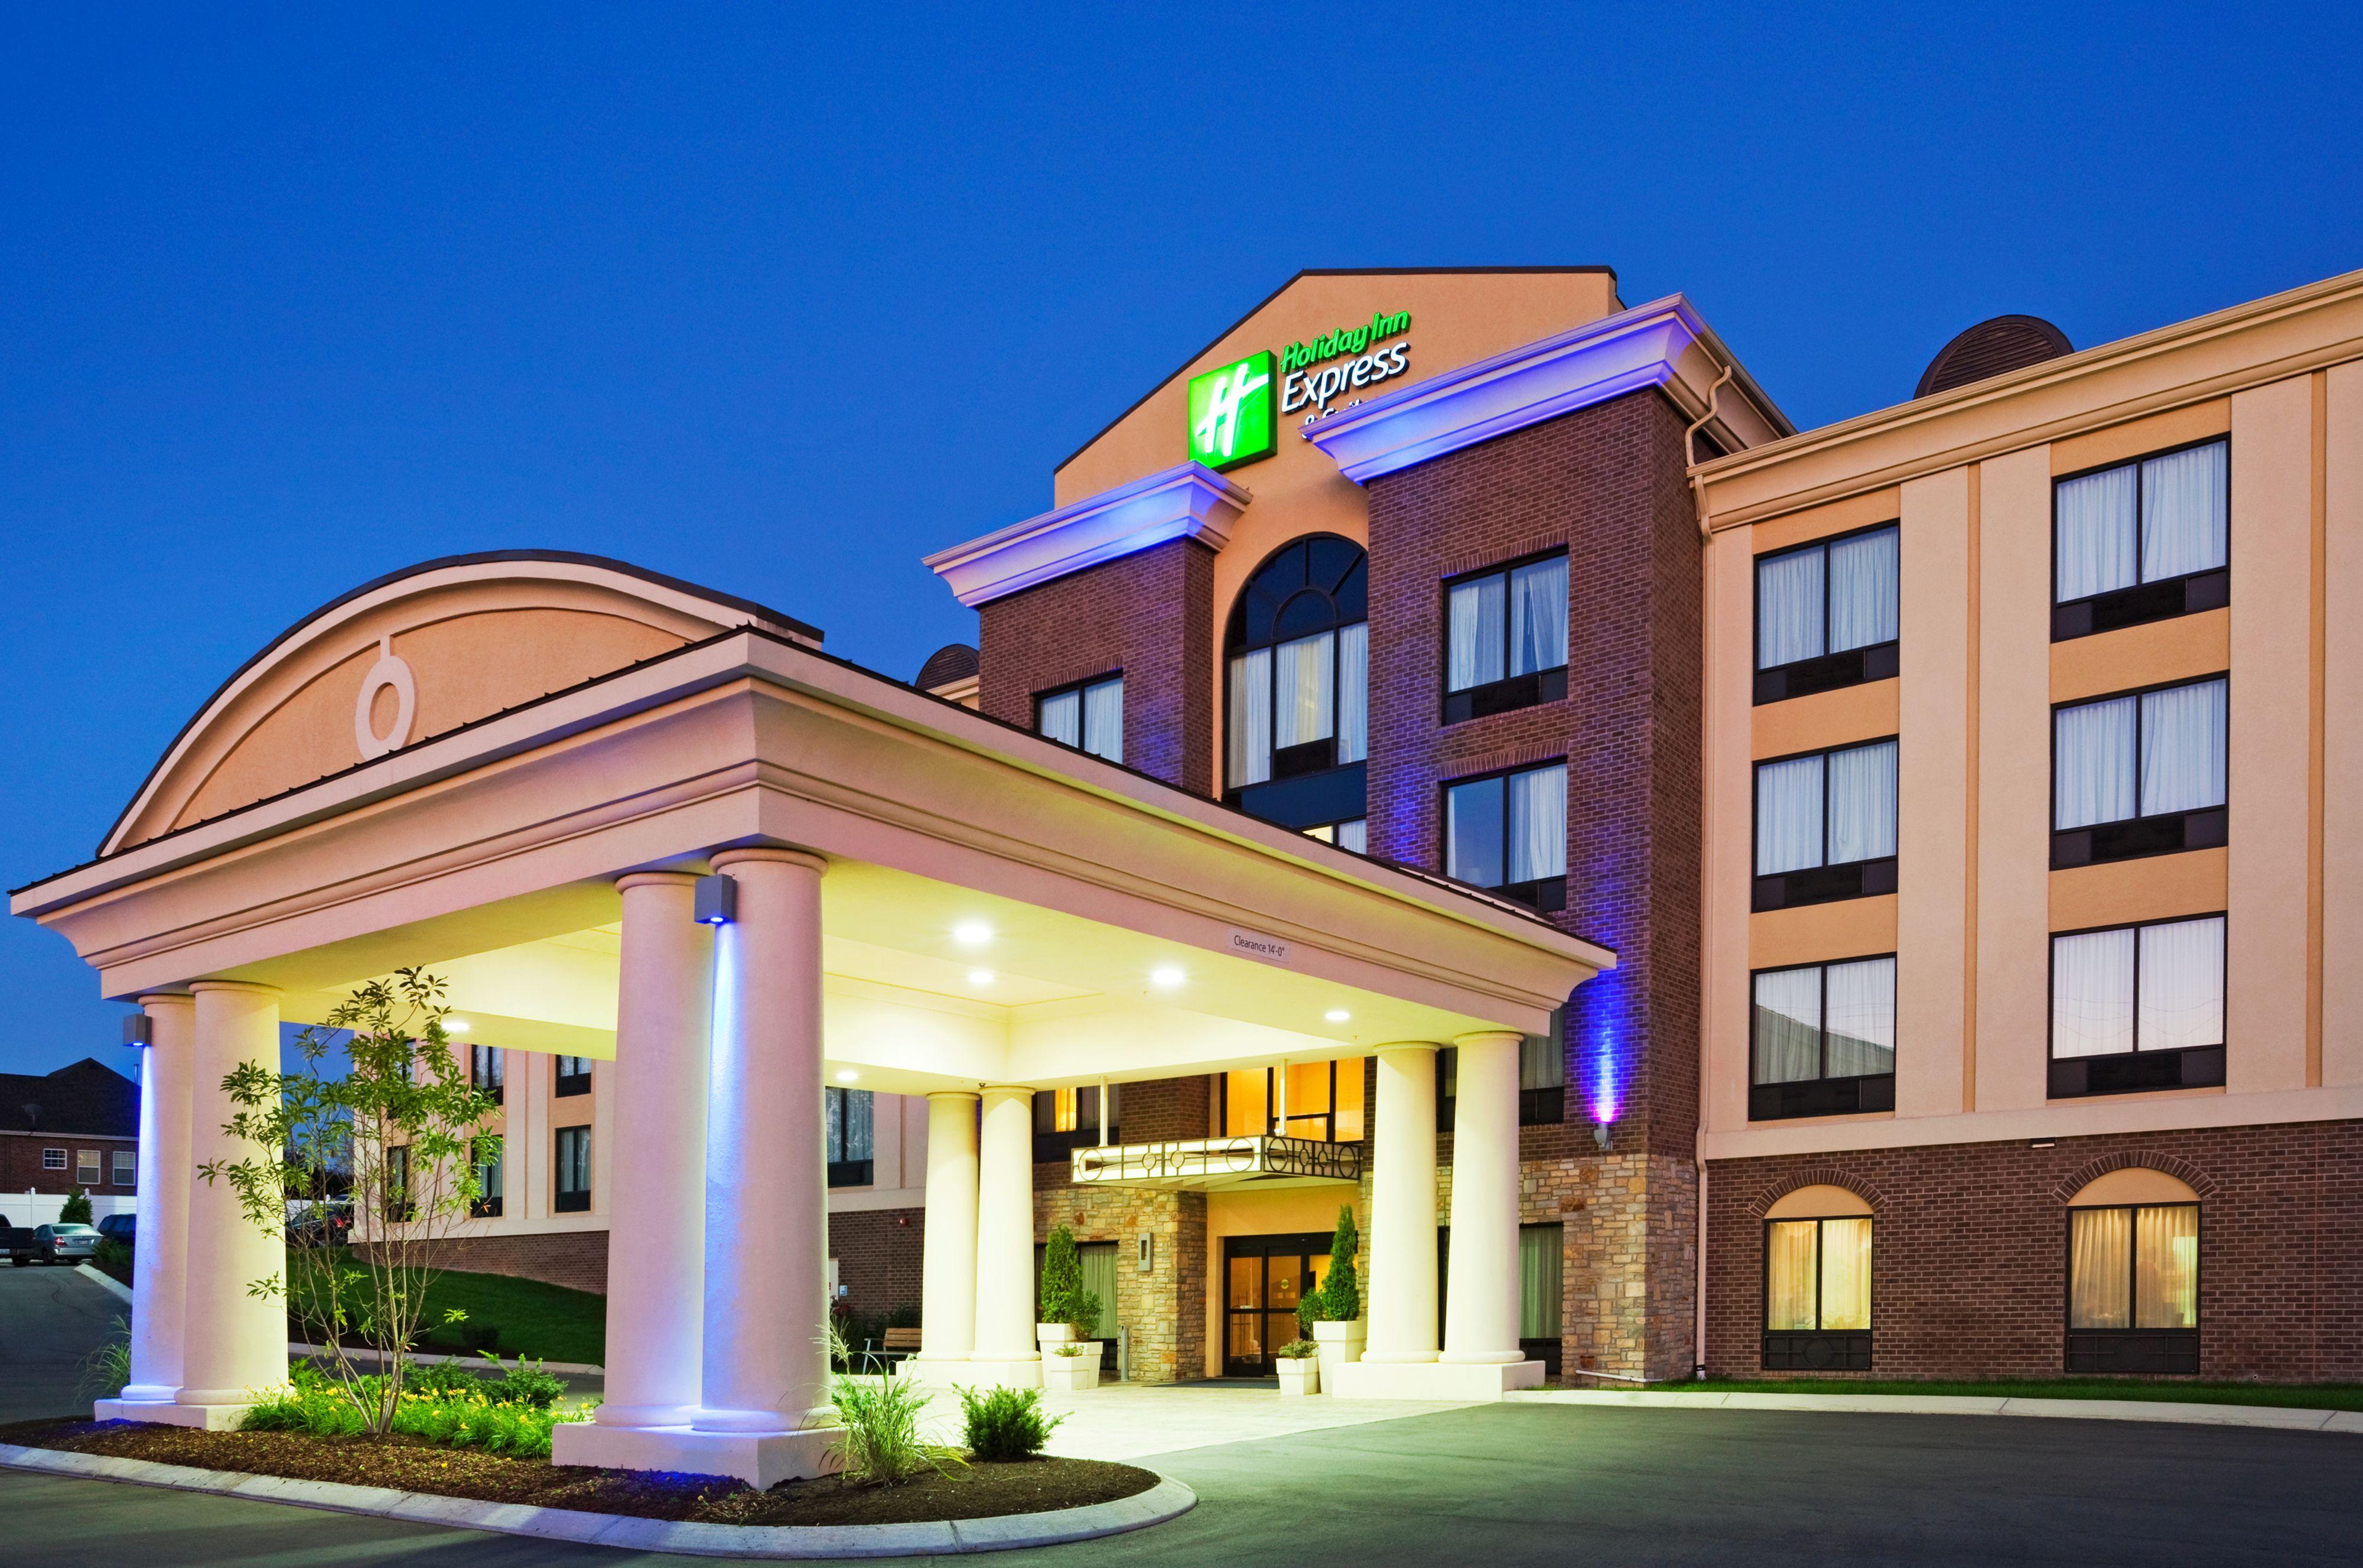 Holiday Inn Express Amp Suites Smithfield Selma I 95